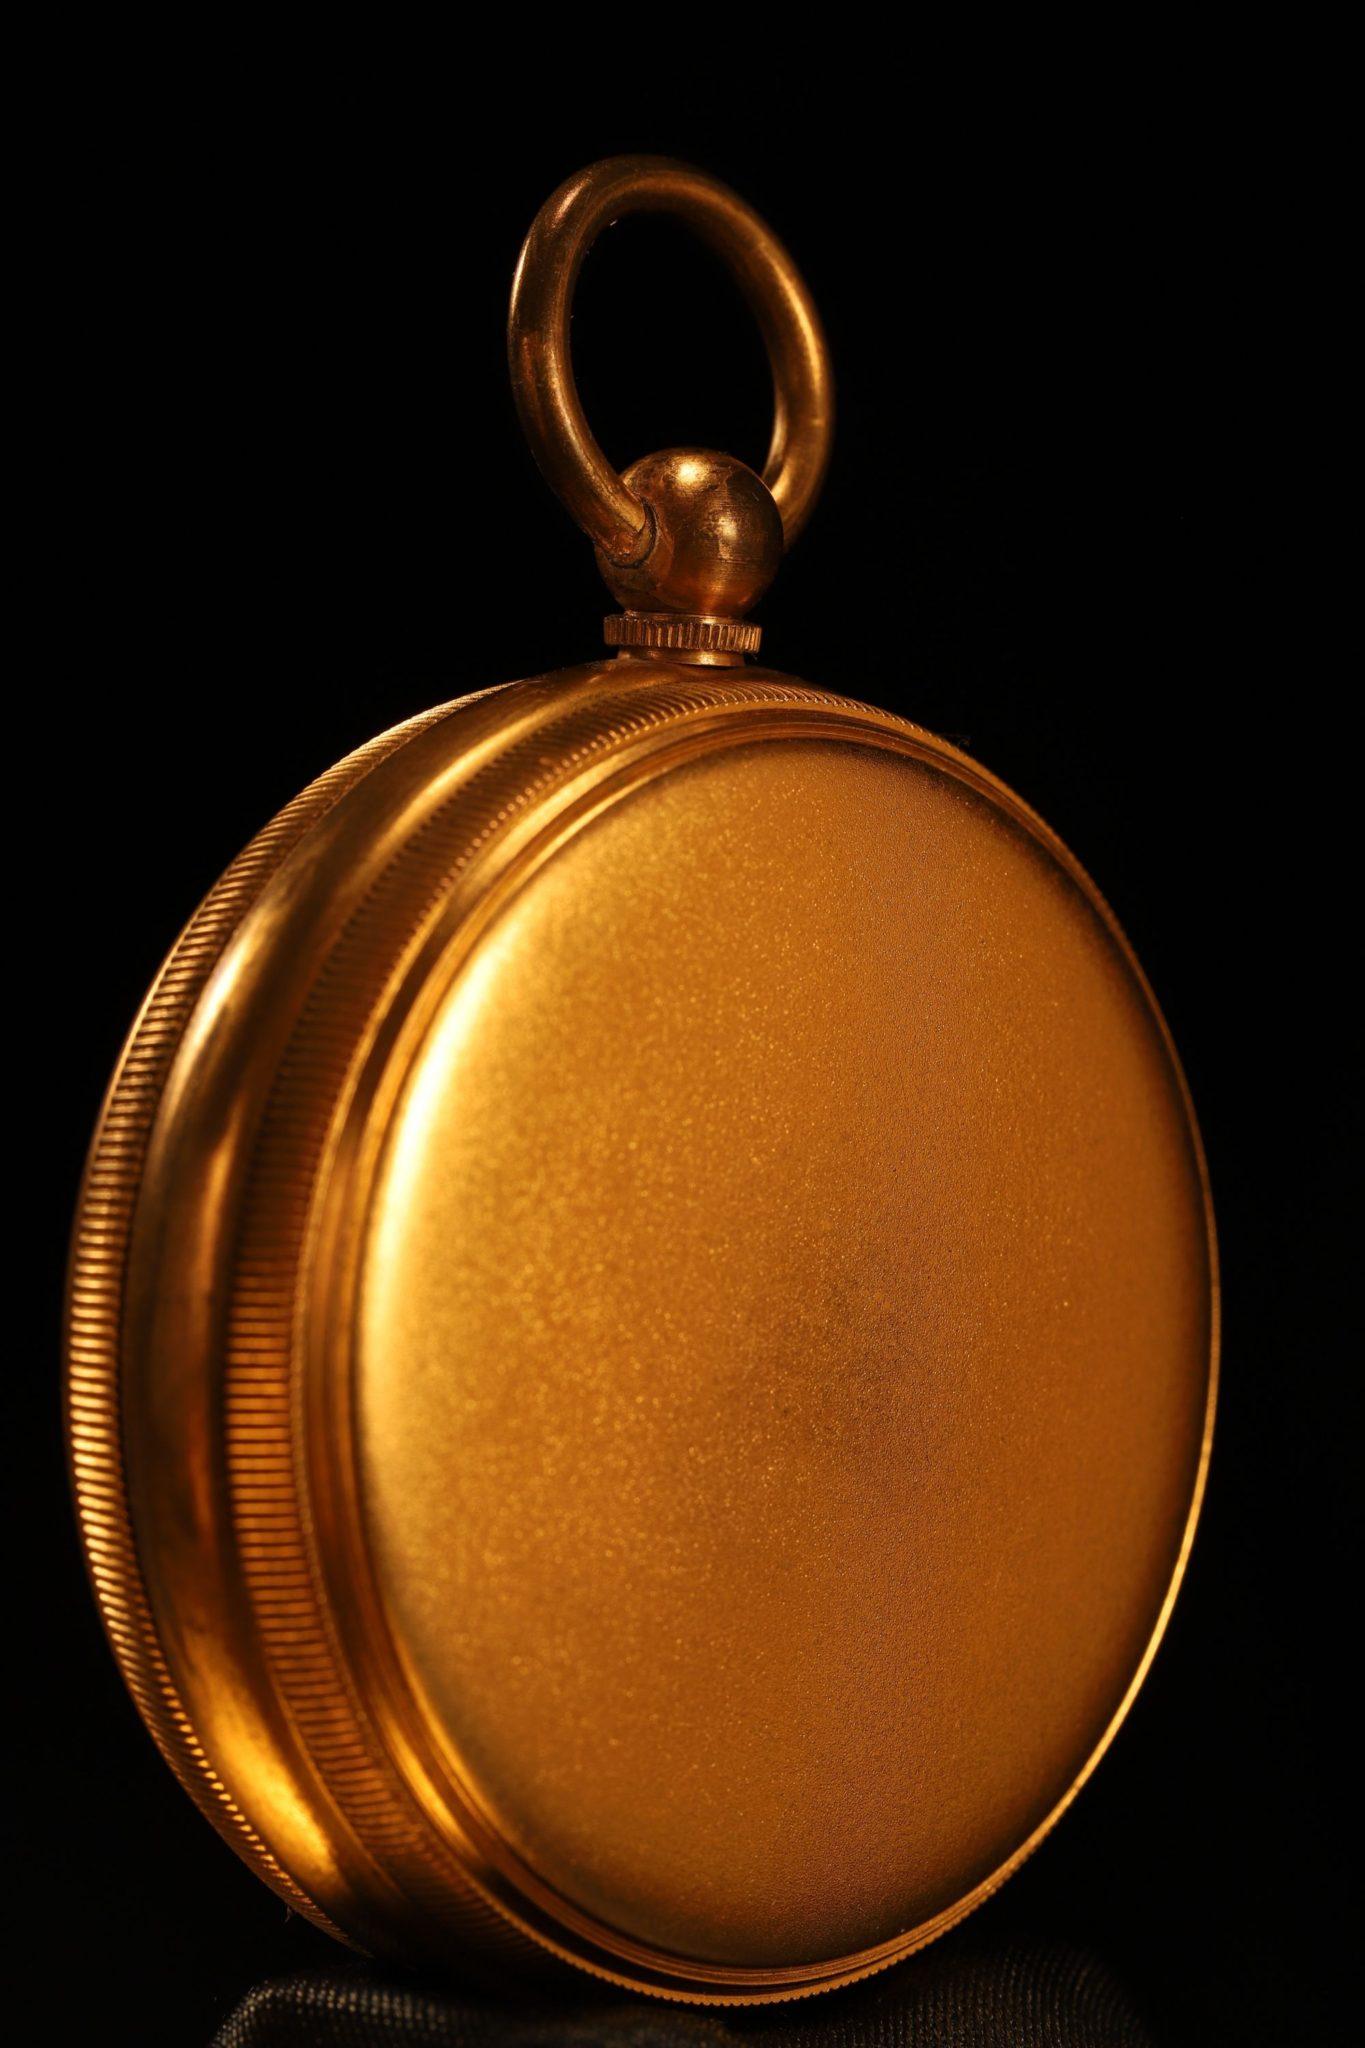 Image of Negretti & Zambra Pocket Barometer Travel Compendium No 9886 c1905